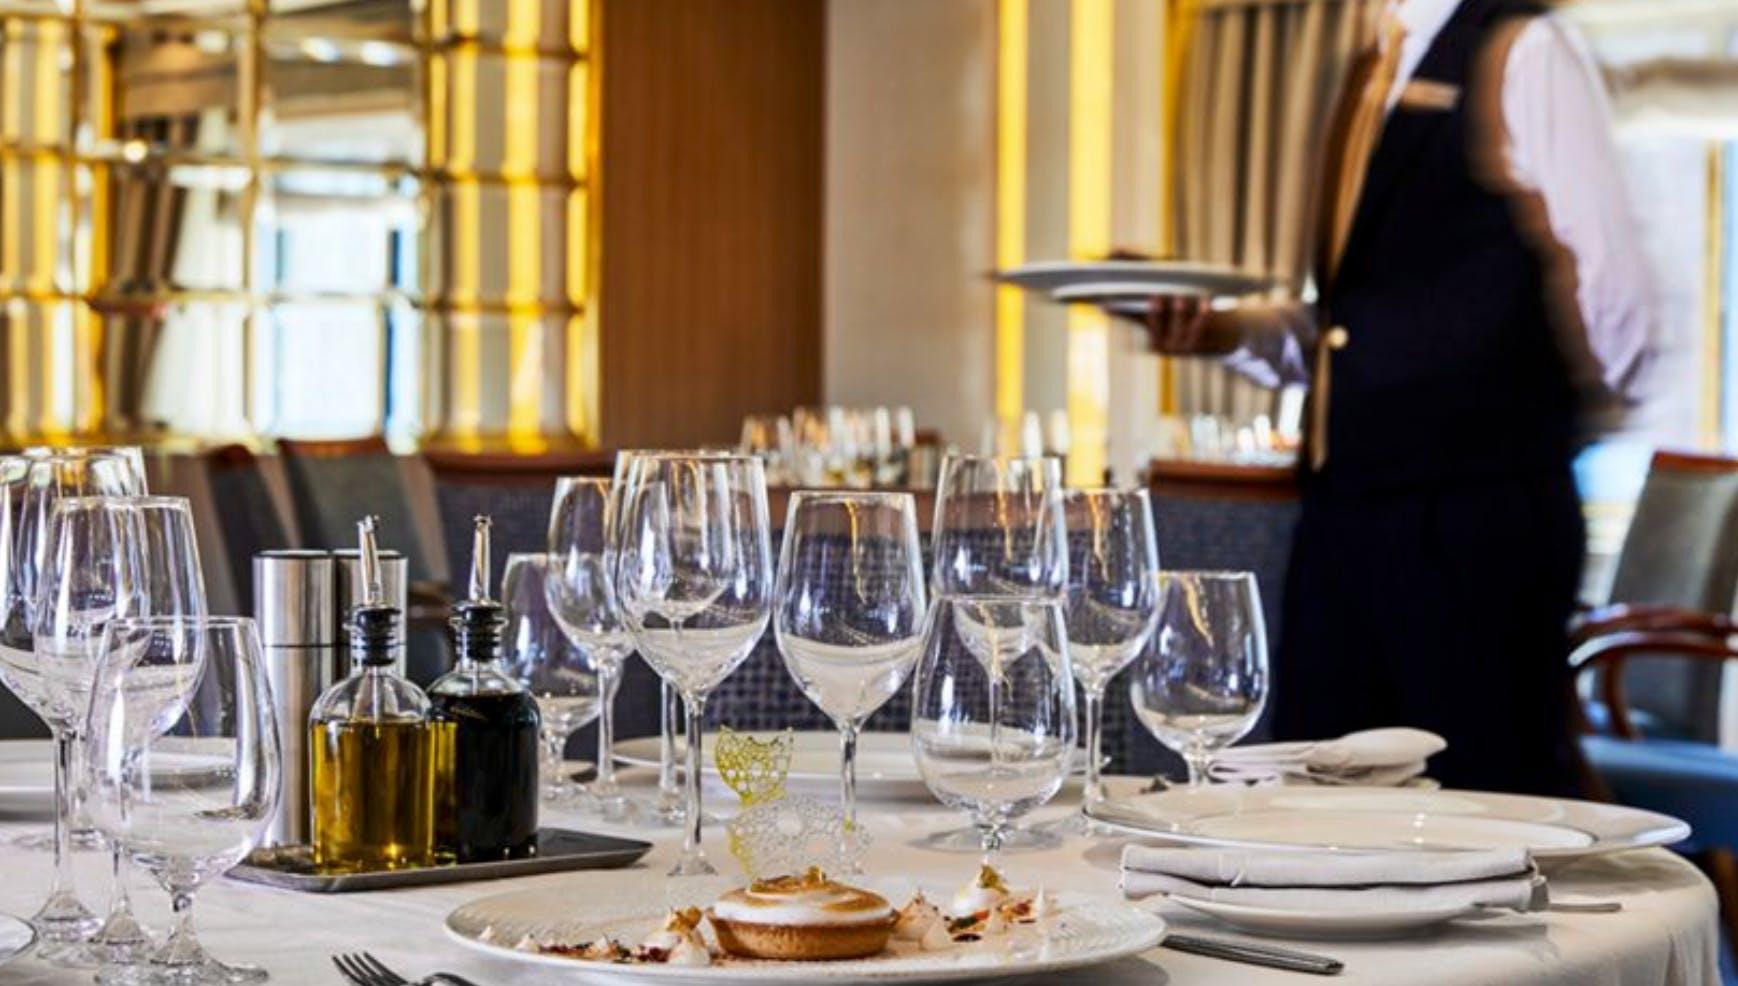 Silversea's La Terrazza Italian restaurant